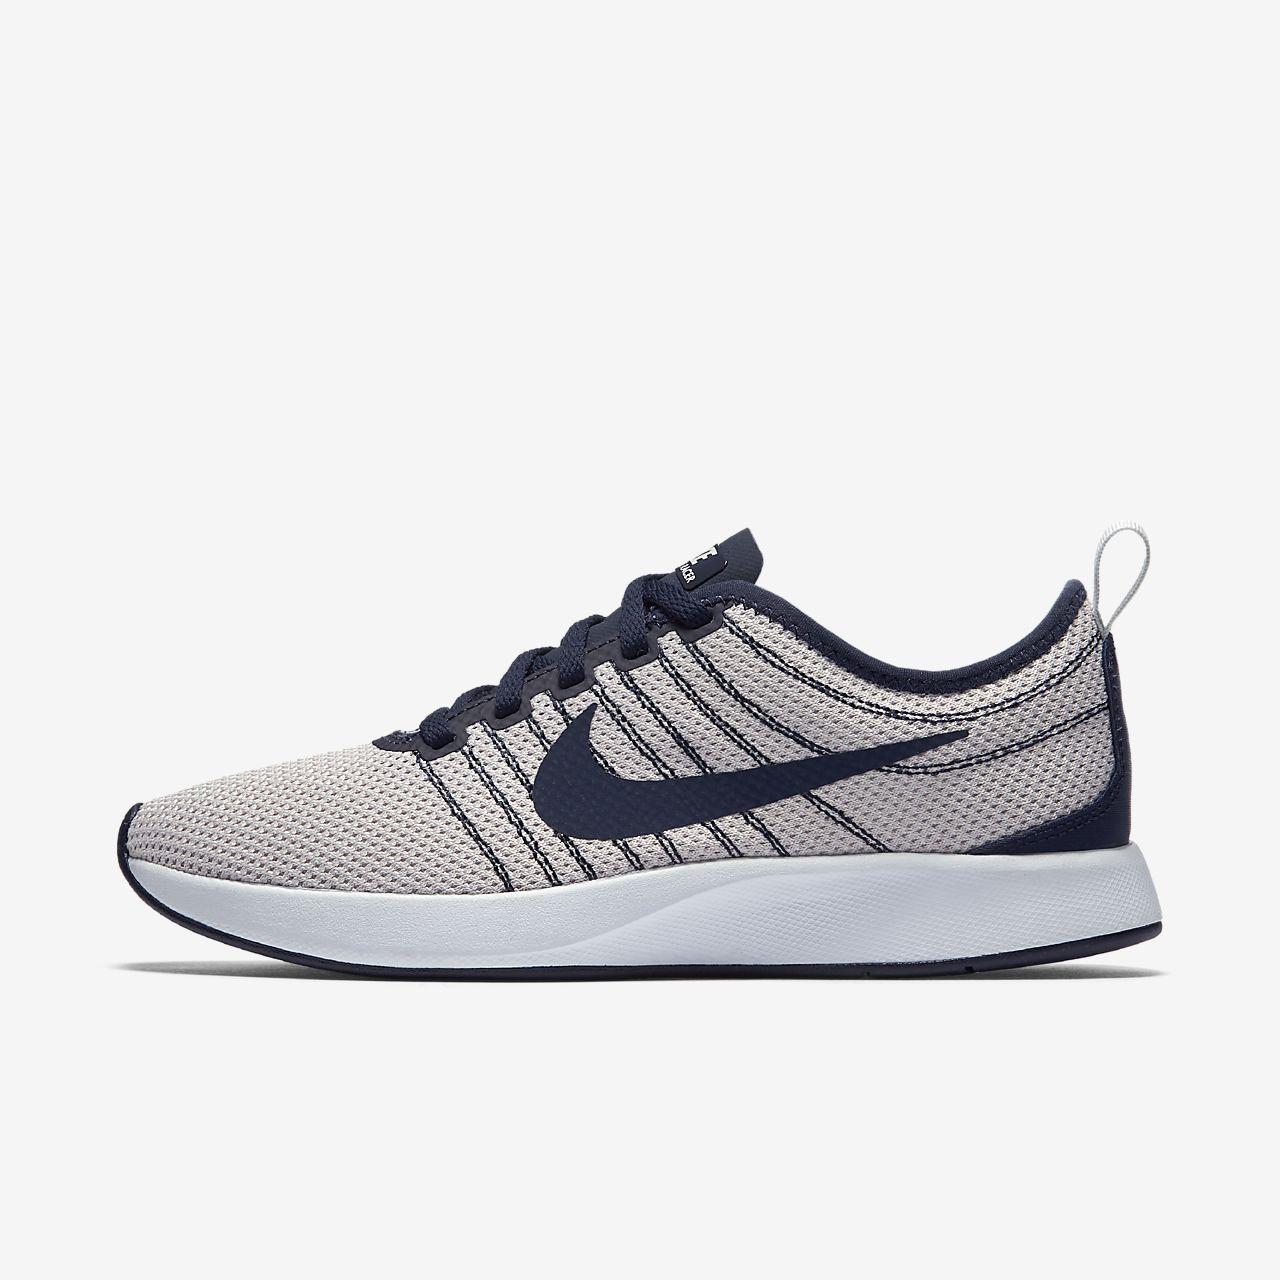 Chaussure Nike Dualtone Racer pour BE